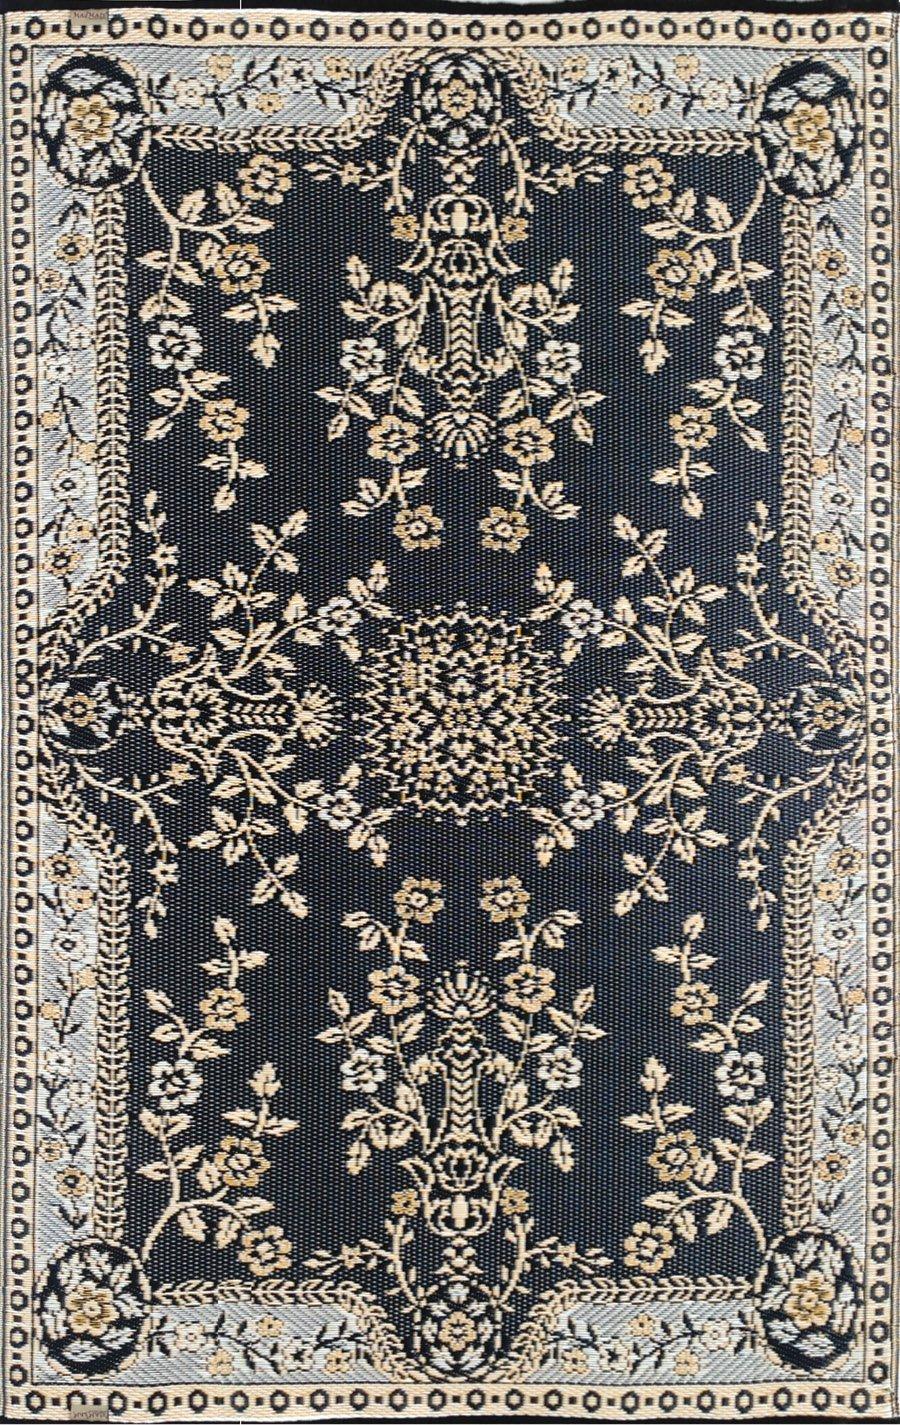 Mad Mats Garland Indoor/Outdoor Floor Mat, 6 by 9-Feet, Black and Tan